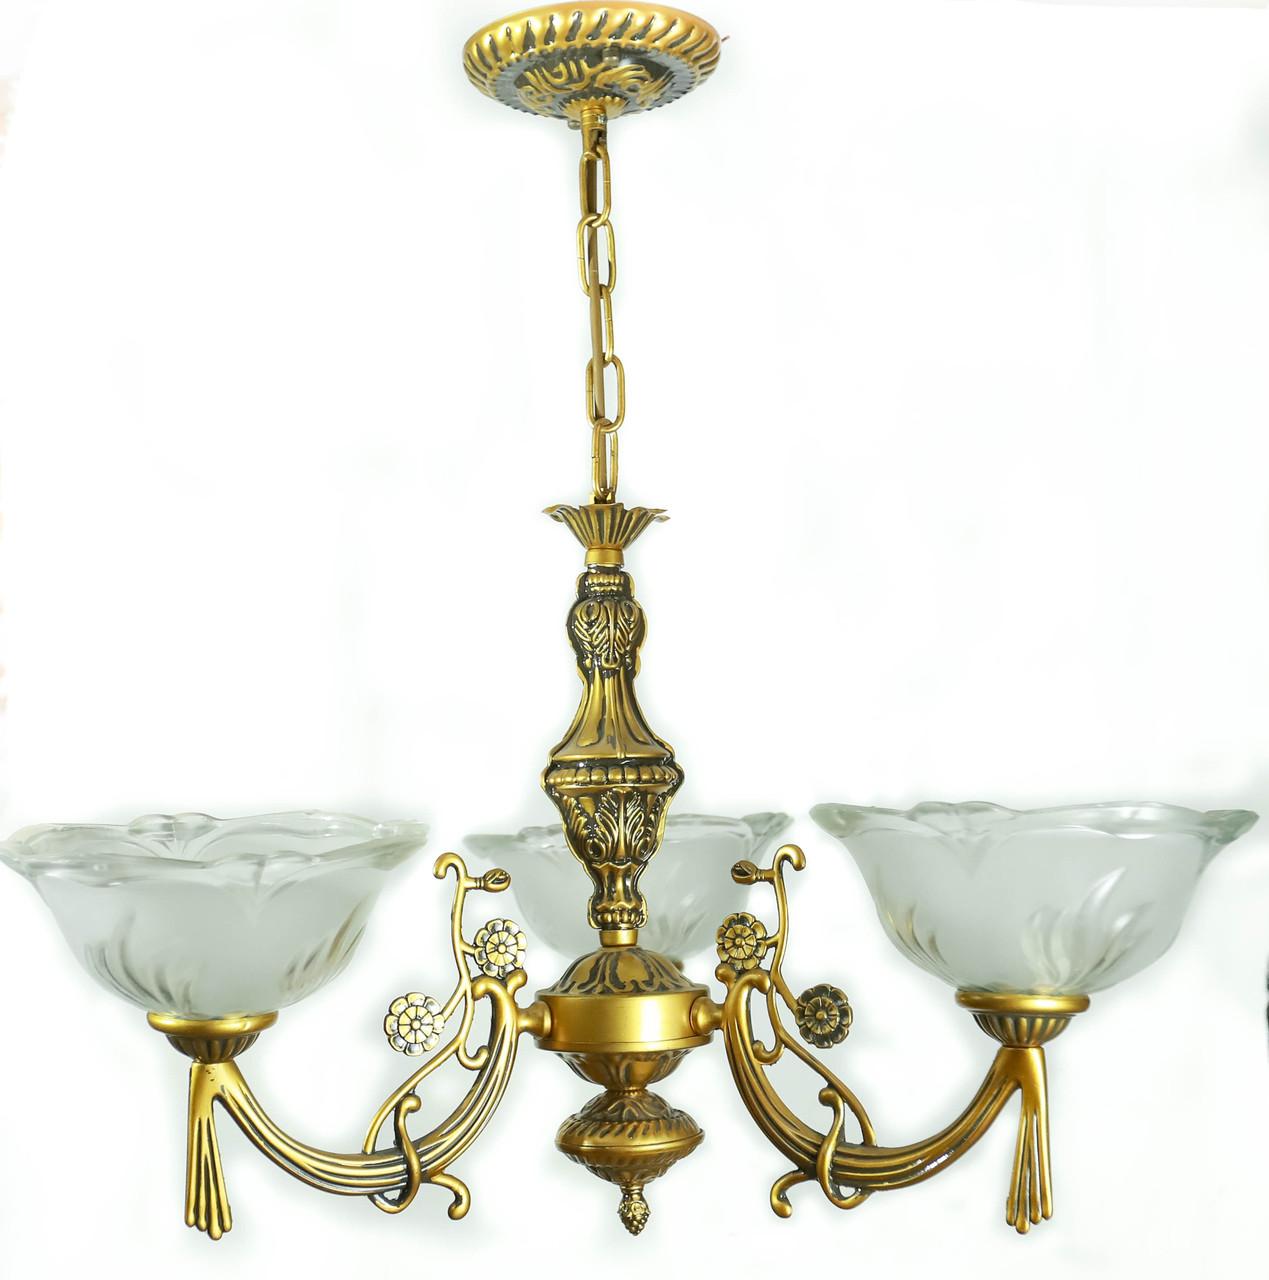 Люстра на 3 плафони, Панська класика, старовинна світла бронза